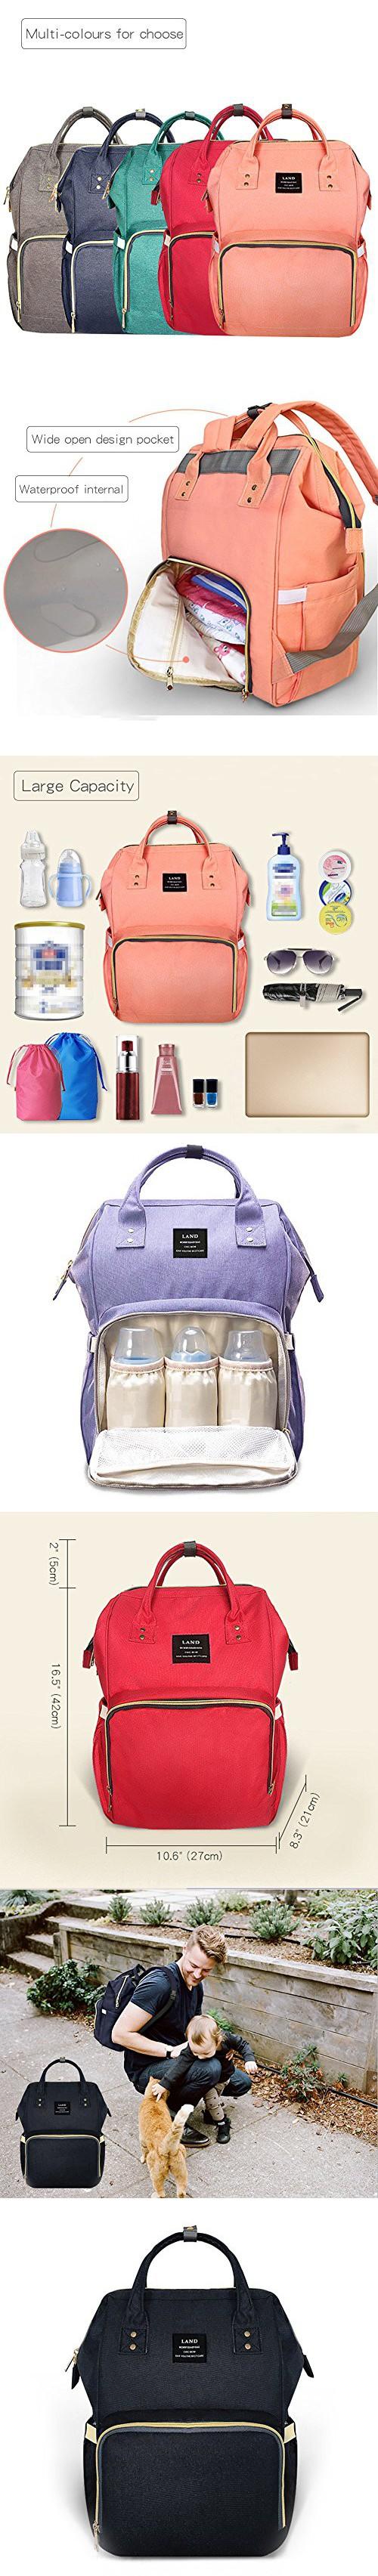 e968c75f148b Wide Open Designed Baby Diaper Bag, Ticent Multi-Function Travel ...